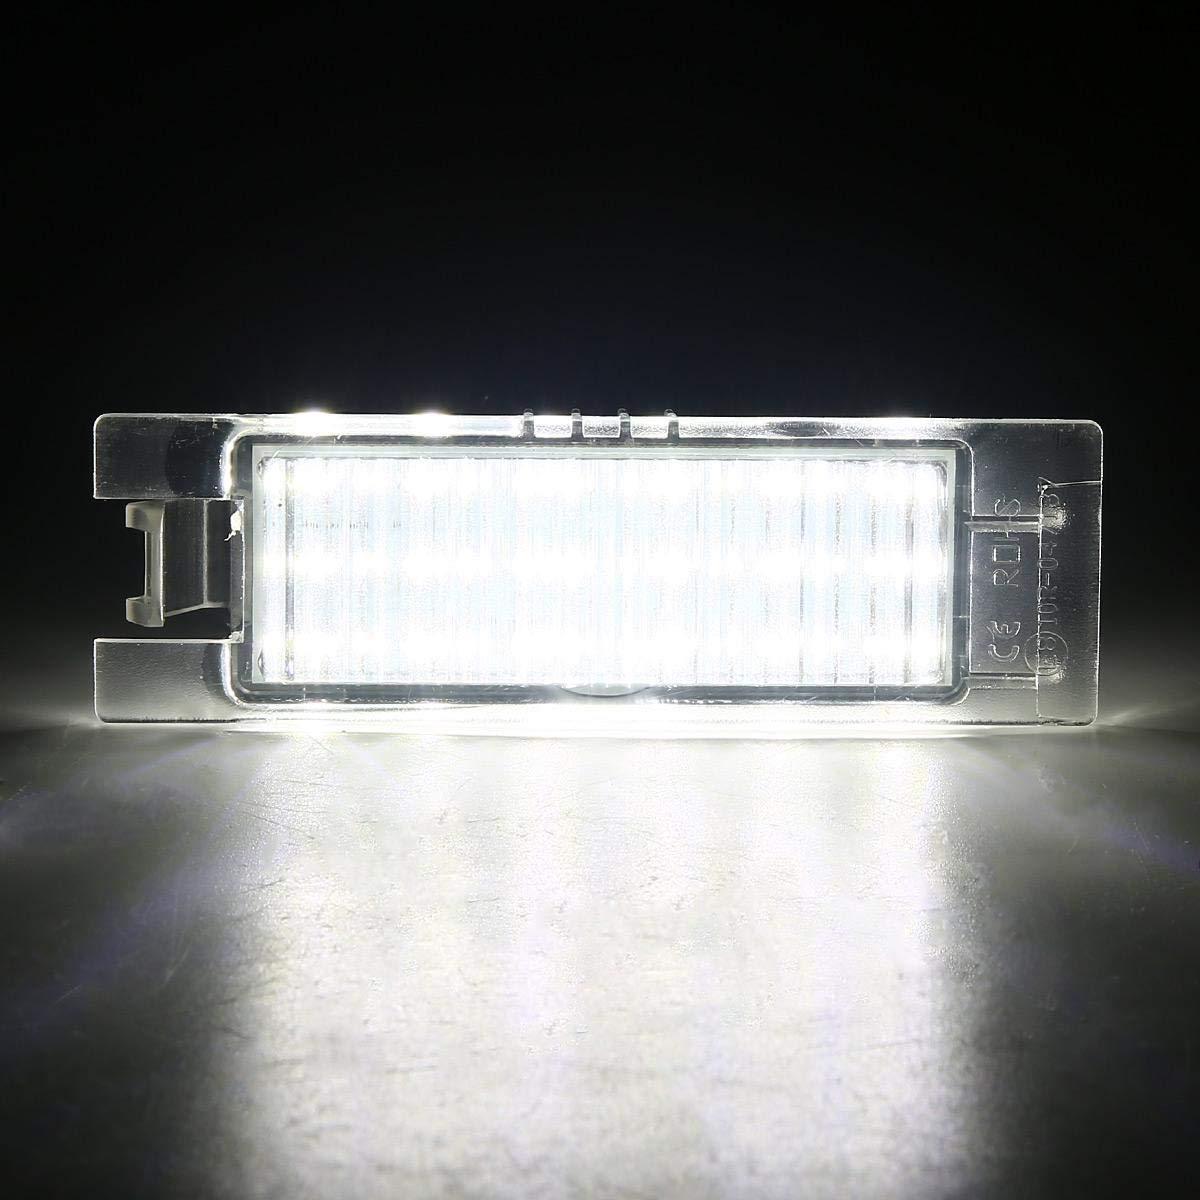 LED License Plate Lamp White Light For Opel Zafira B Astra H Corsa D Insignia